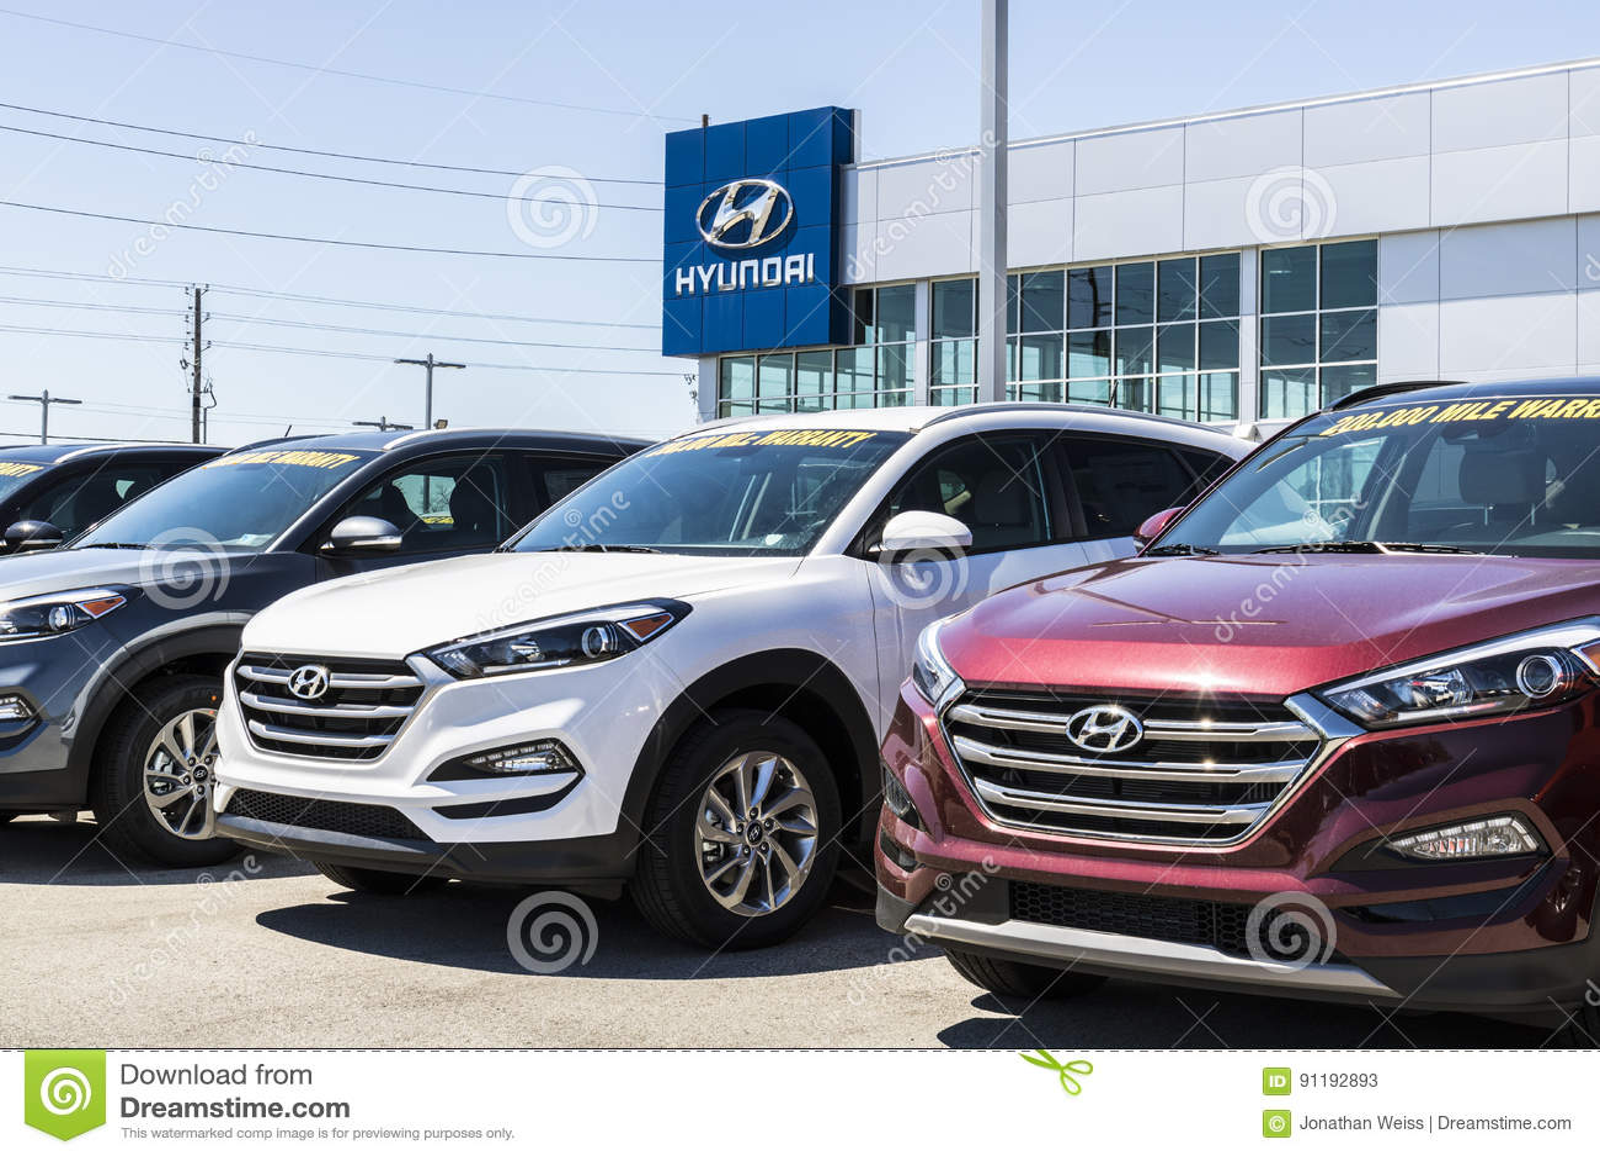 Hyundai Dealership Indianapolis >> Indianapolis Circa April 2017 Hyundai Motor Company Dealership